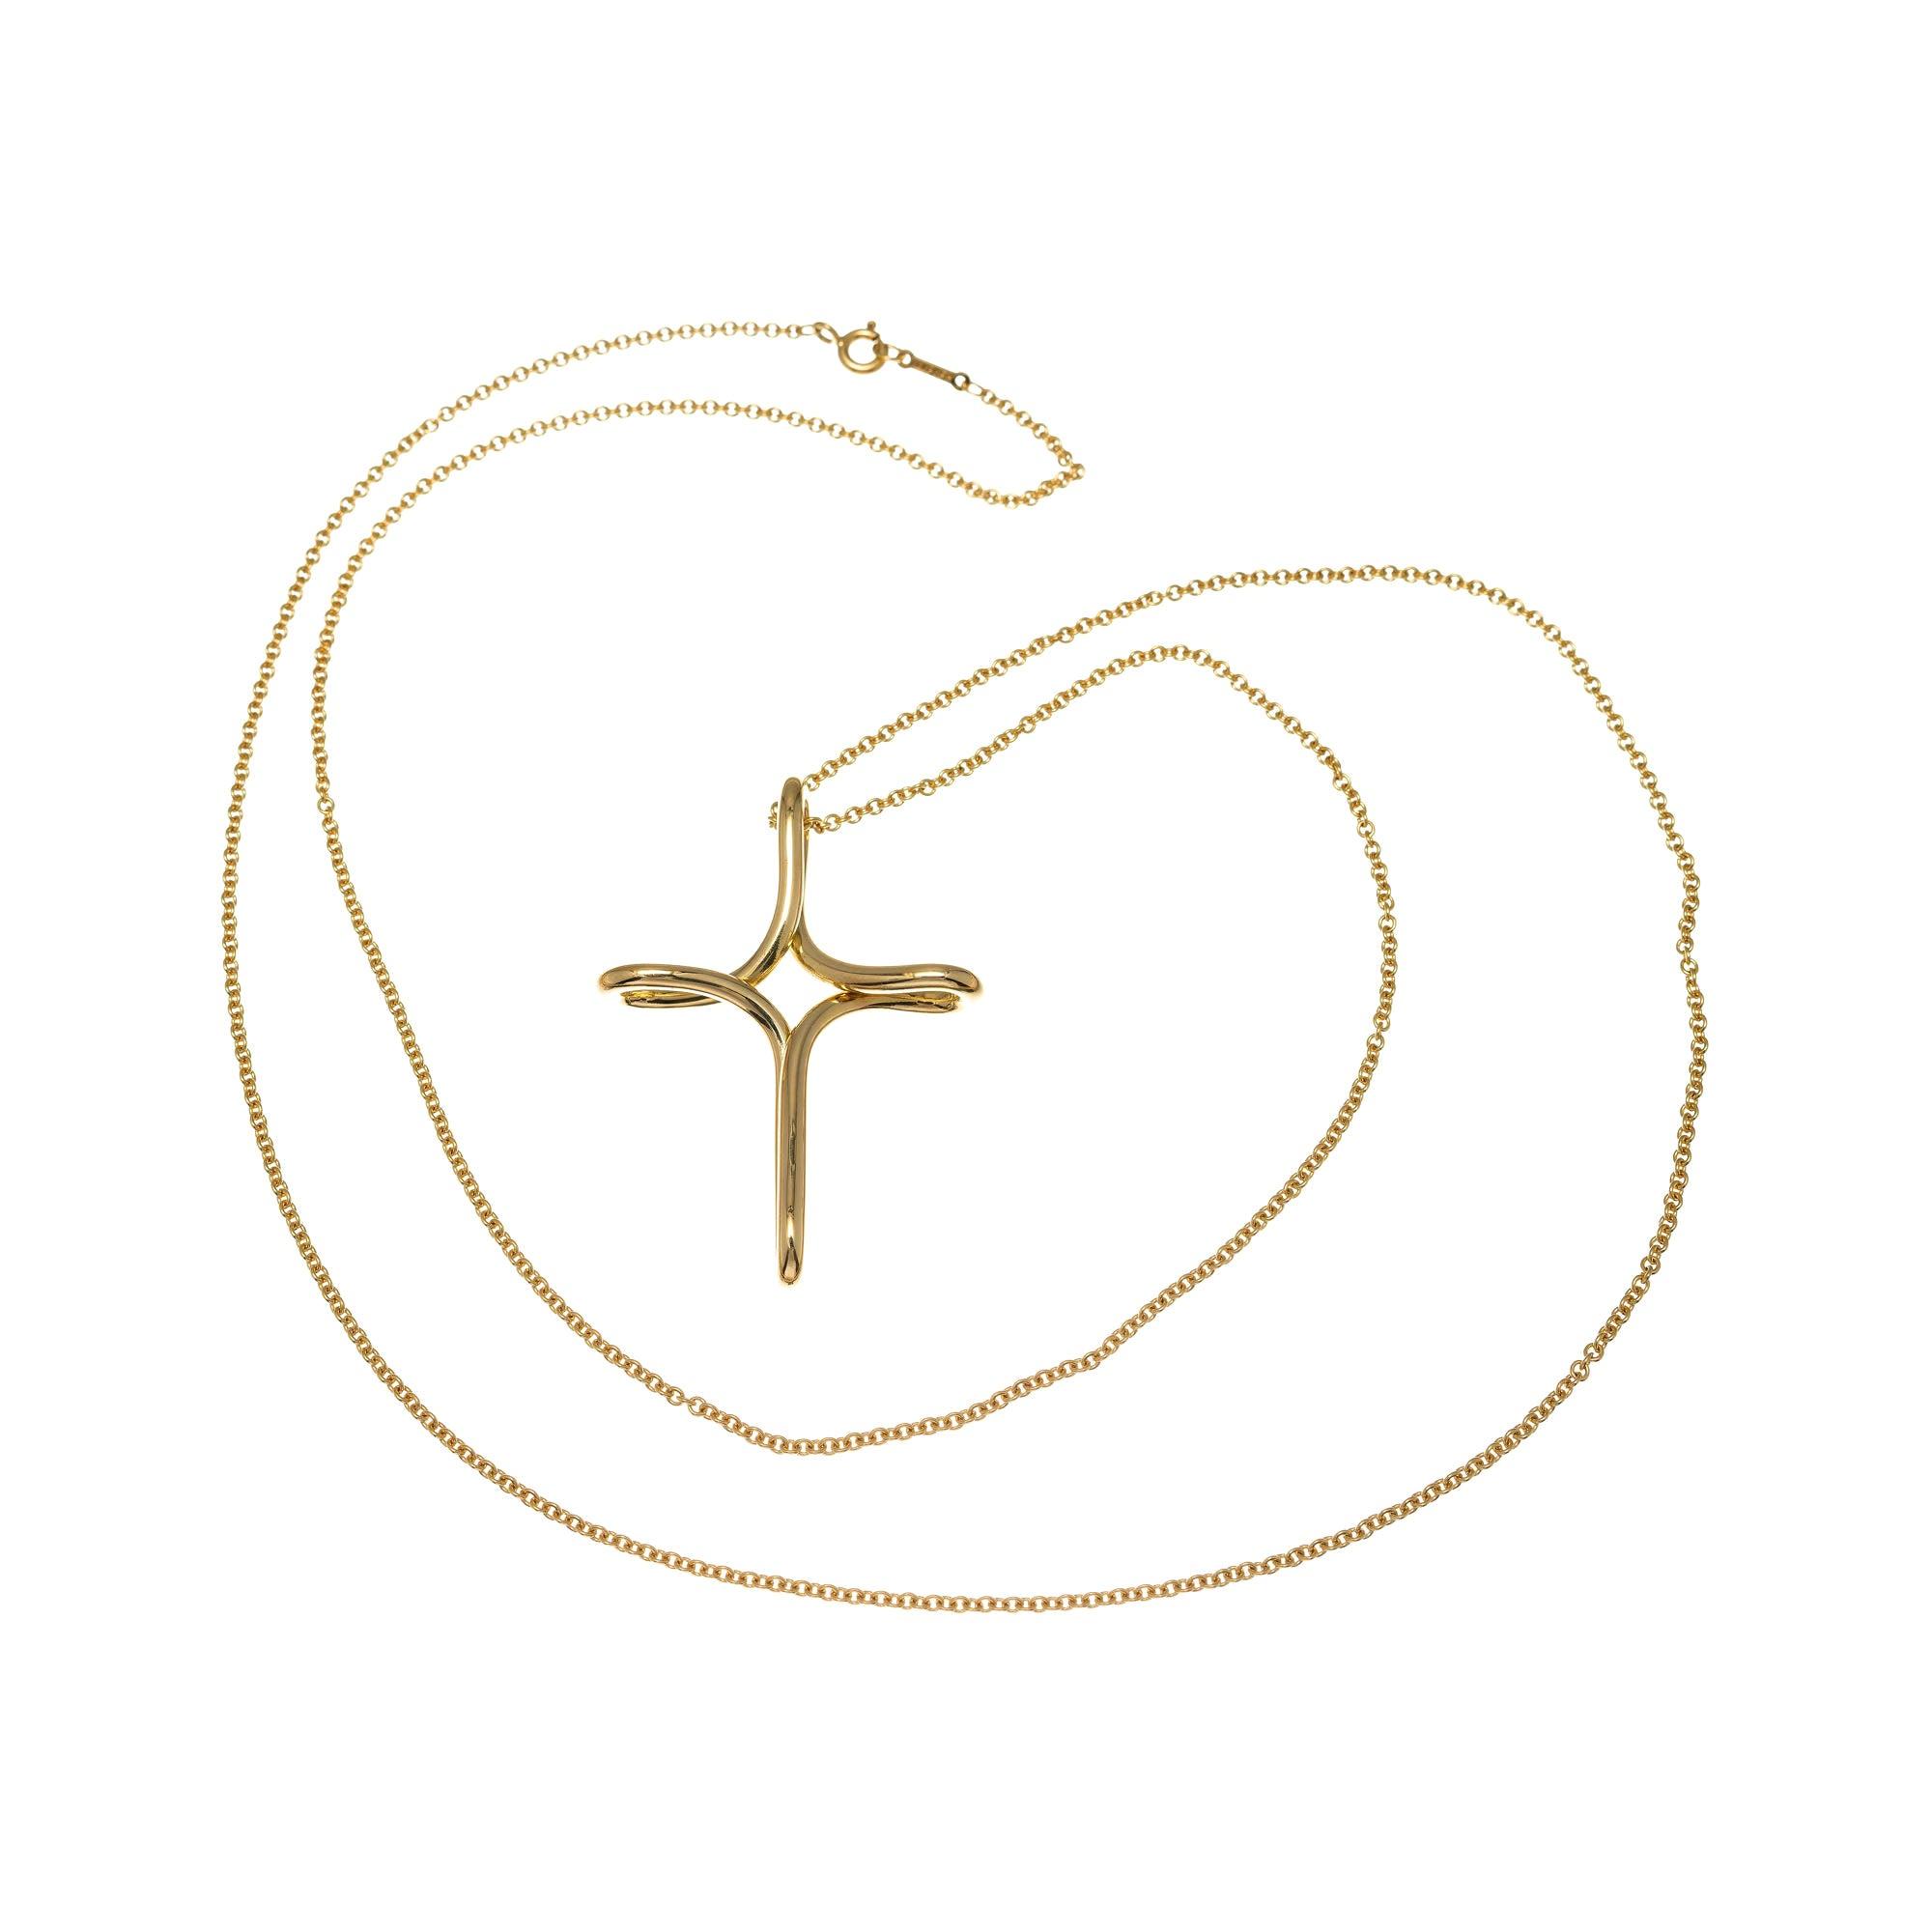 Tiffany & Co. Elsa Peretti Yellow Gold Infinity Cross Pendant Necklace